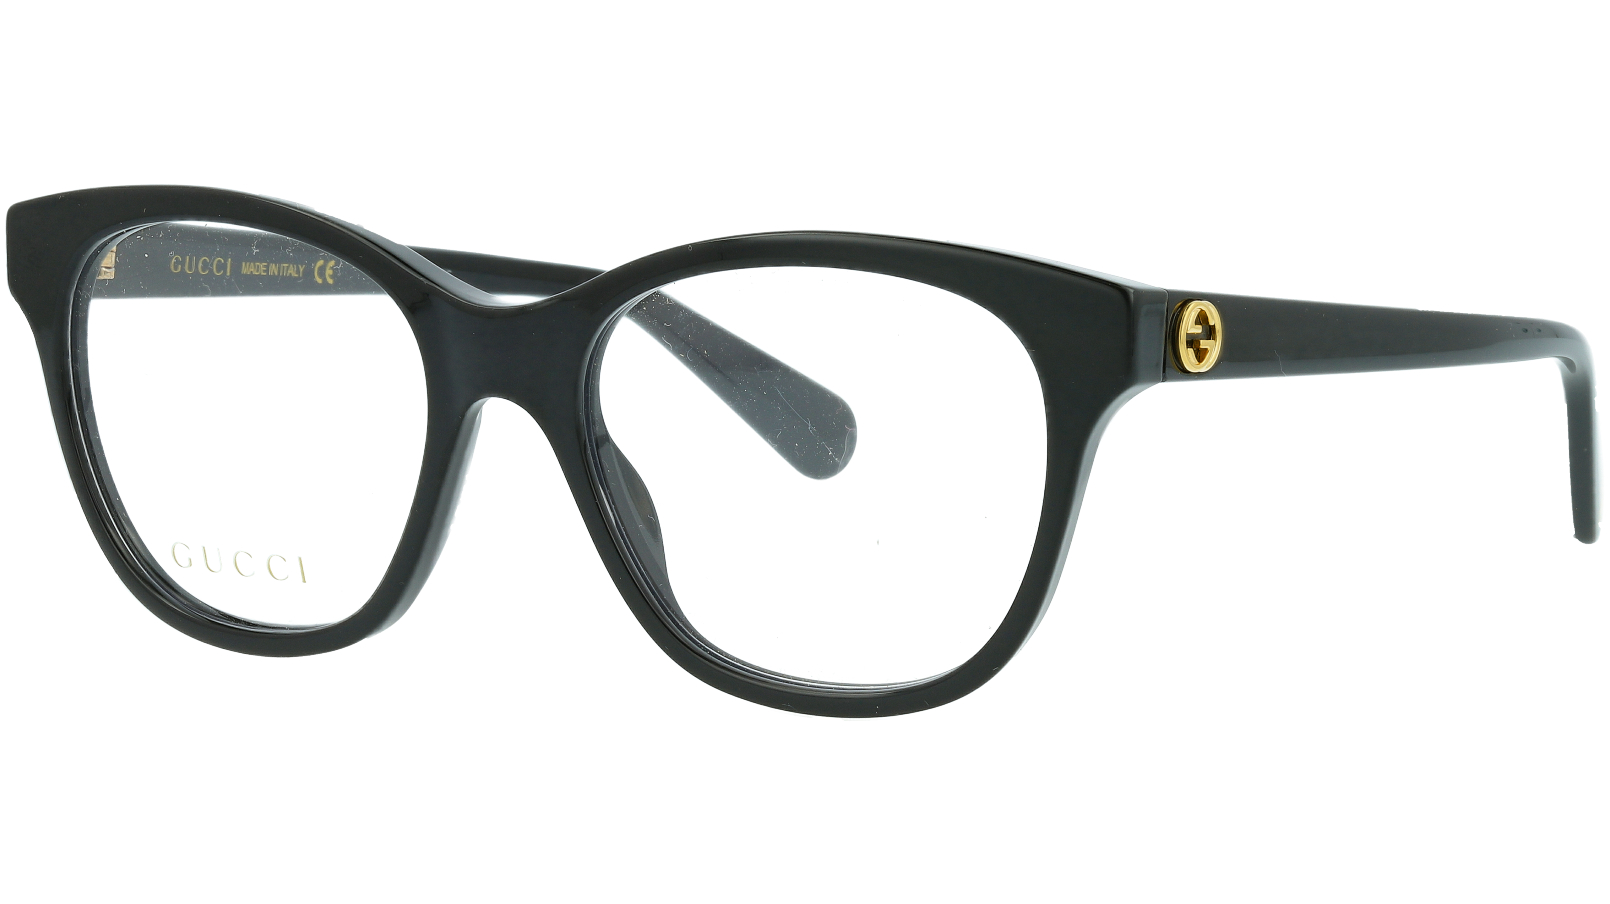 Gucci GG0923O 001 51 Black Cat-eye Glasses